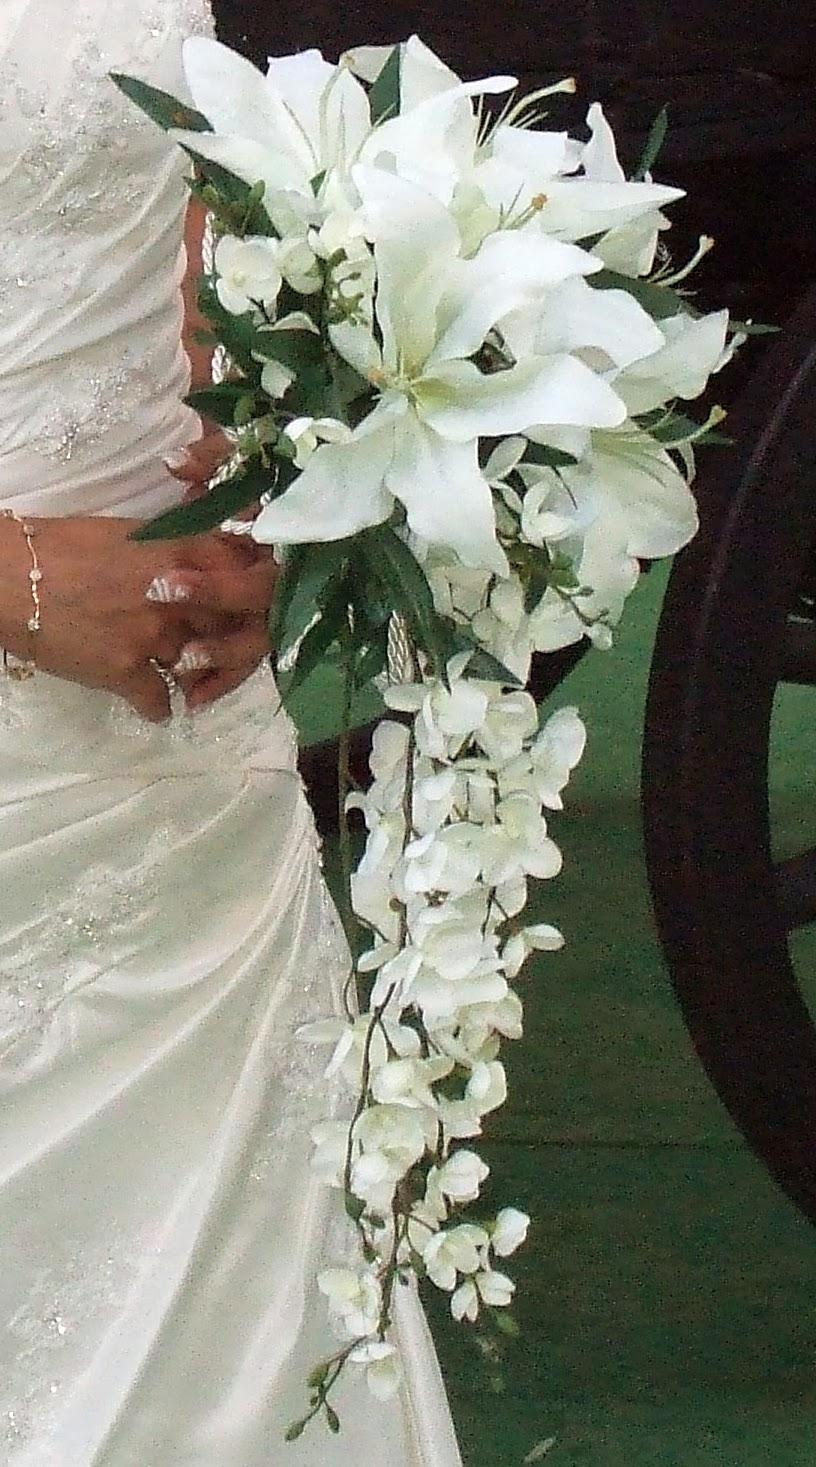 Ramos de novia en cascada parte 2 - Ramos de calas para novias ...